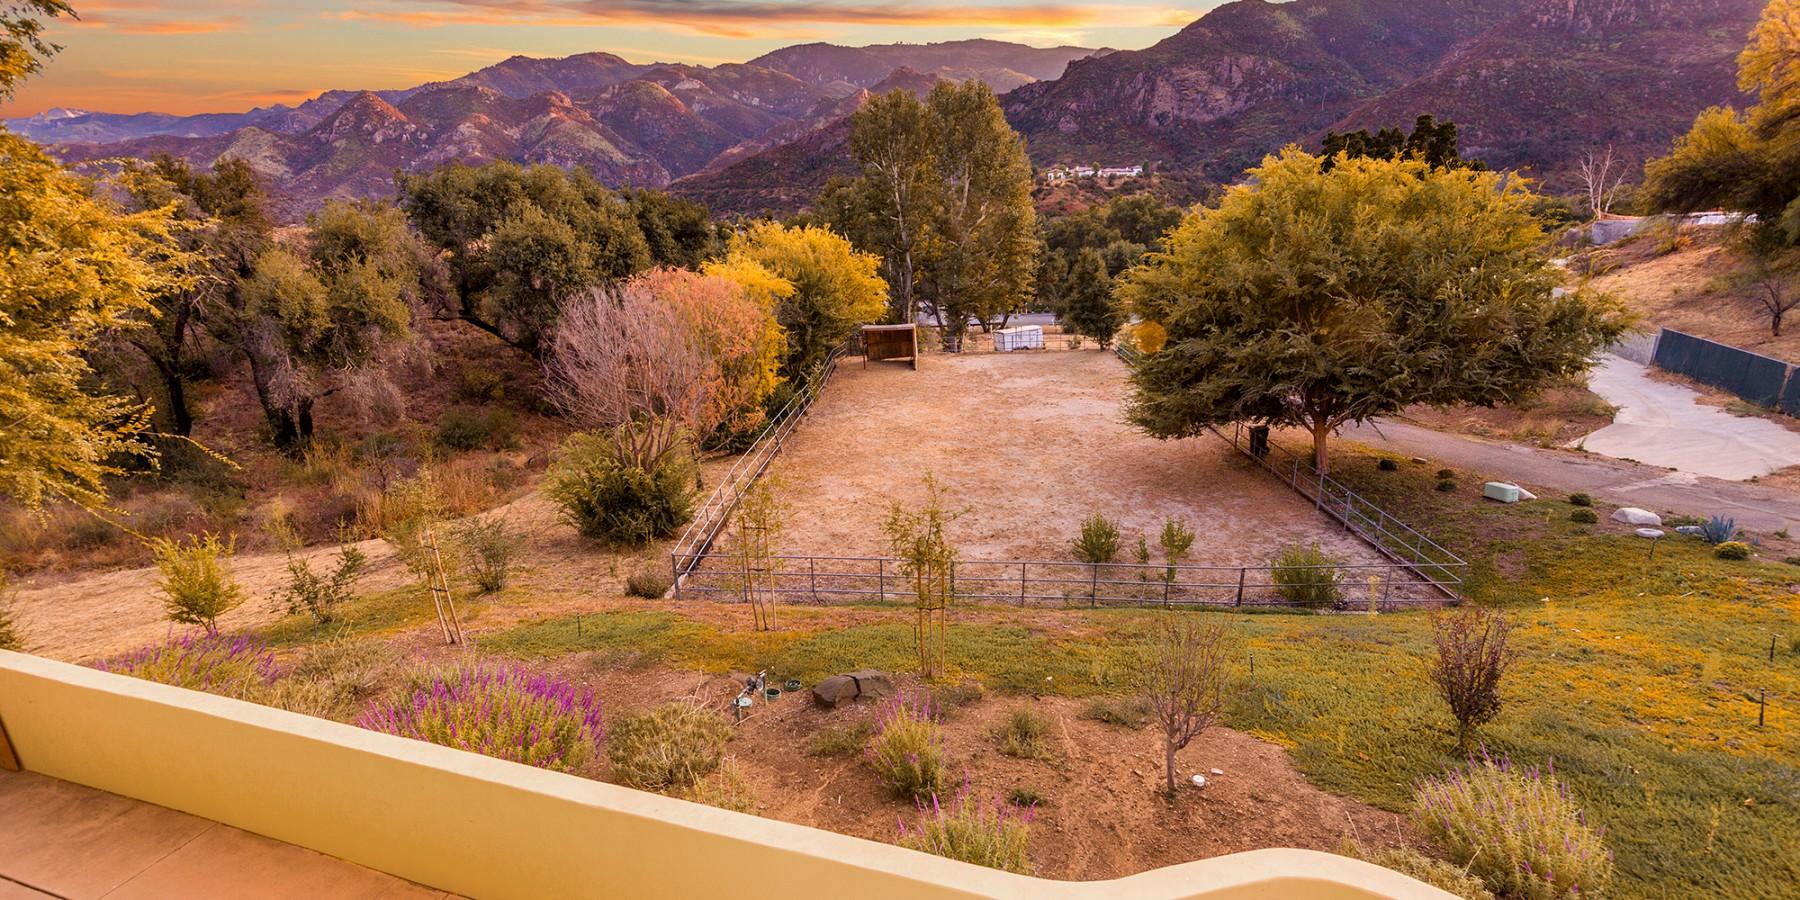 29659 Mulholland Highway, Agoura Hills, CA 91301